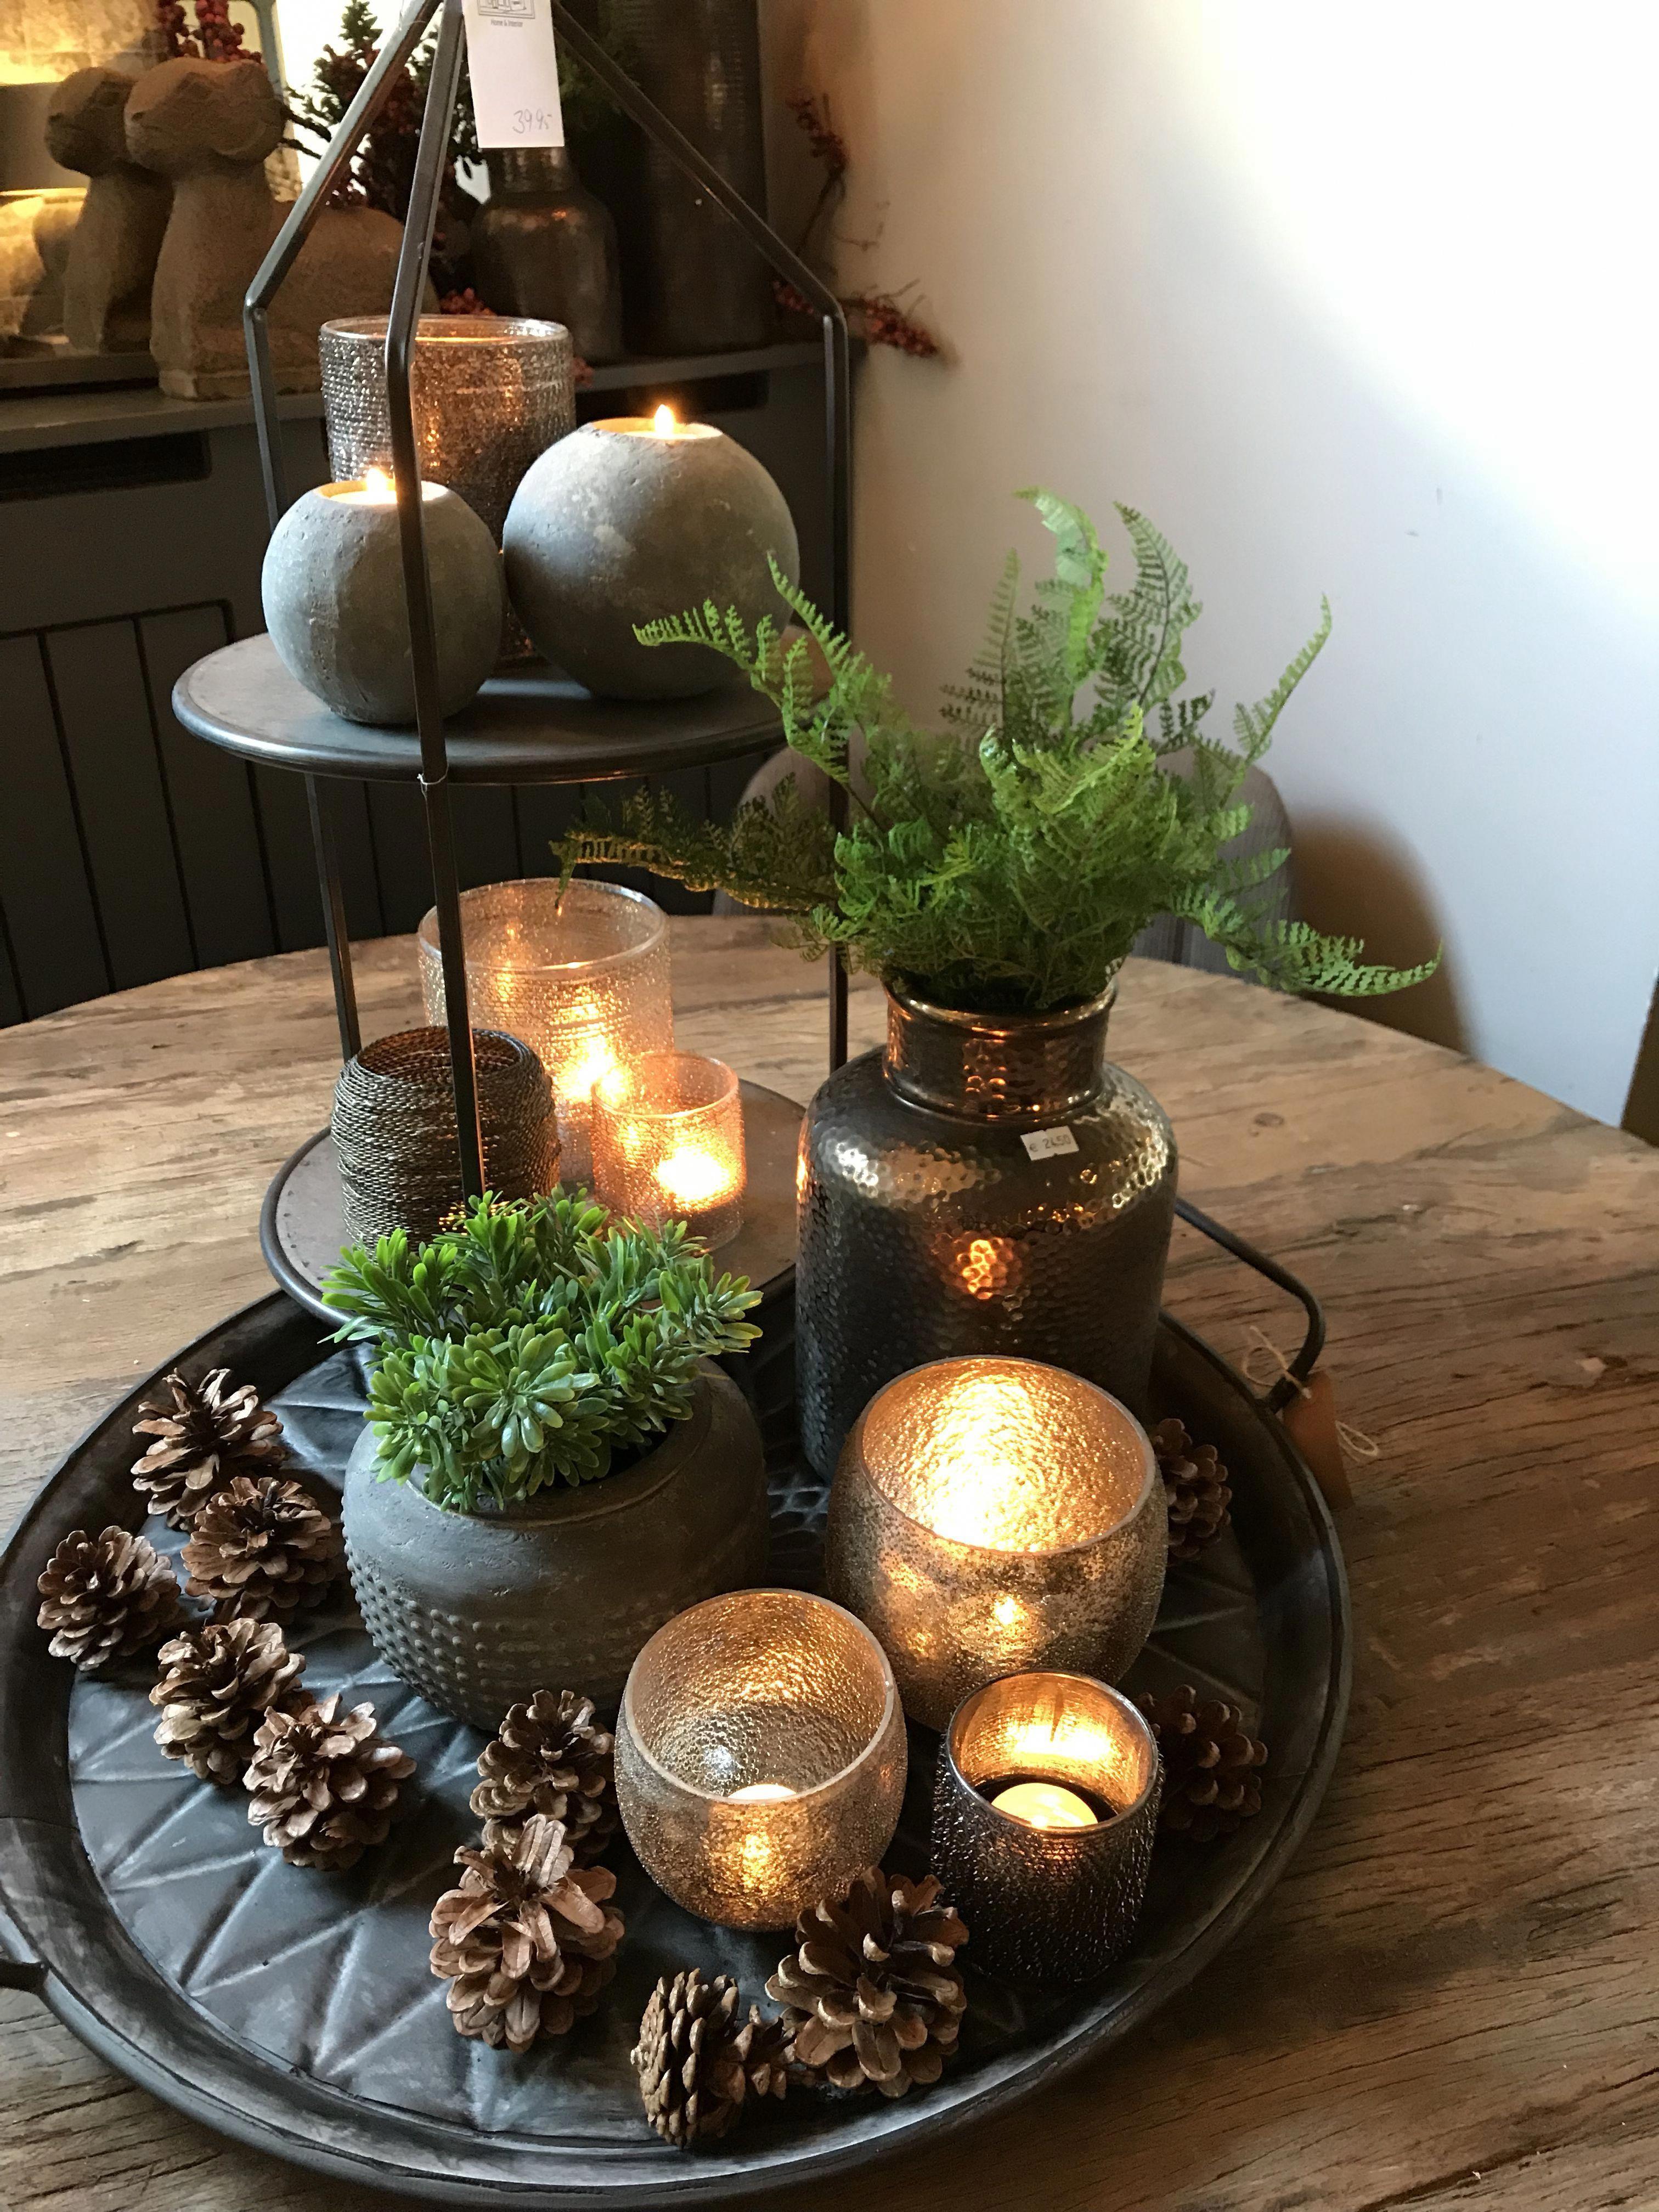 Iets Leuk Op Tafel Wij Helpen U Graag Decoratie Table Decor Living Room Dining Table Centerpiece Candle Decor